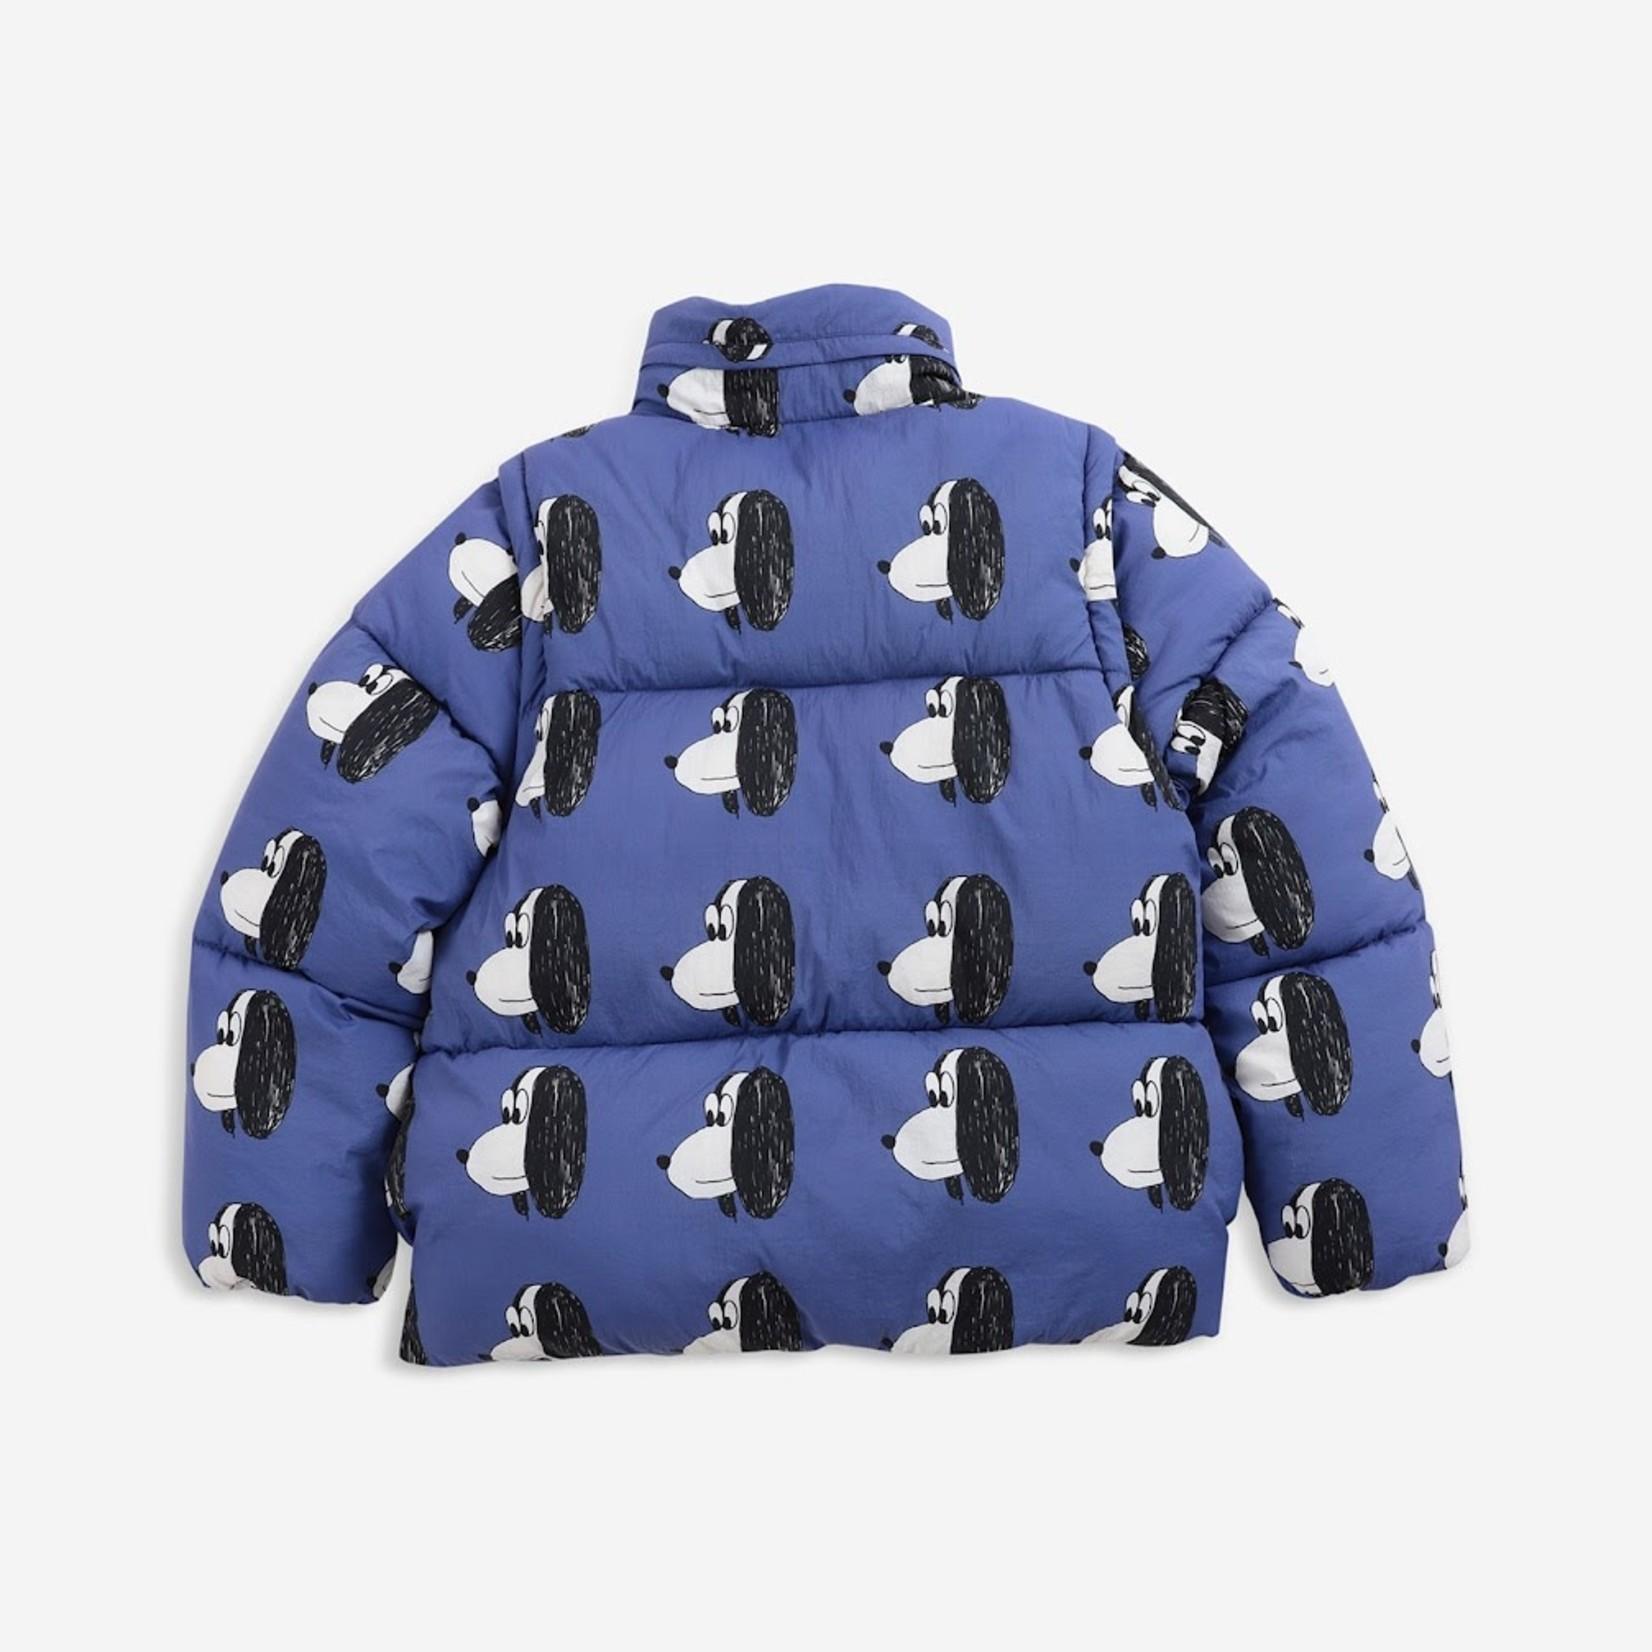 BOBO CHOSES BOBO CHOSES Doggie All Over padded jacket